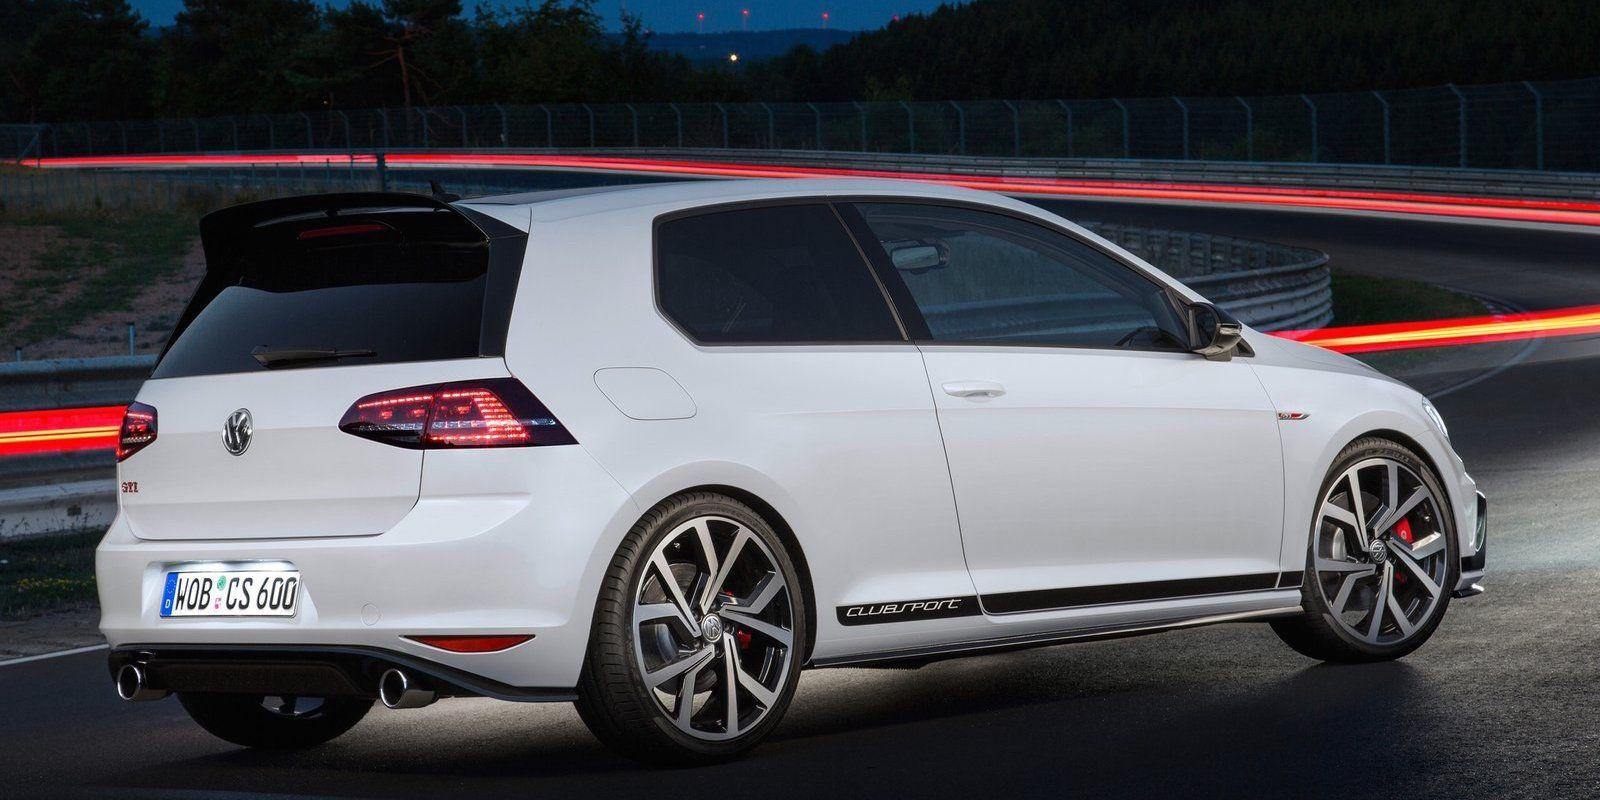 Volkswagen Will Make A 305 Hp Golf Gti Clubsport S Volkswagen Golf Gti Golf Gti Volkswagen Polo